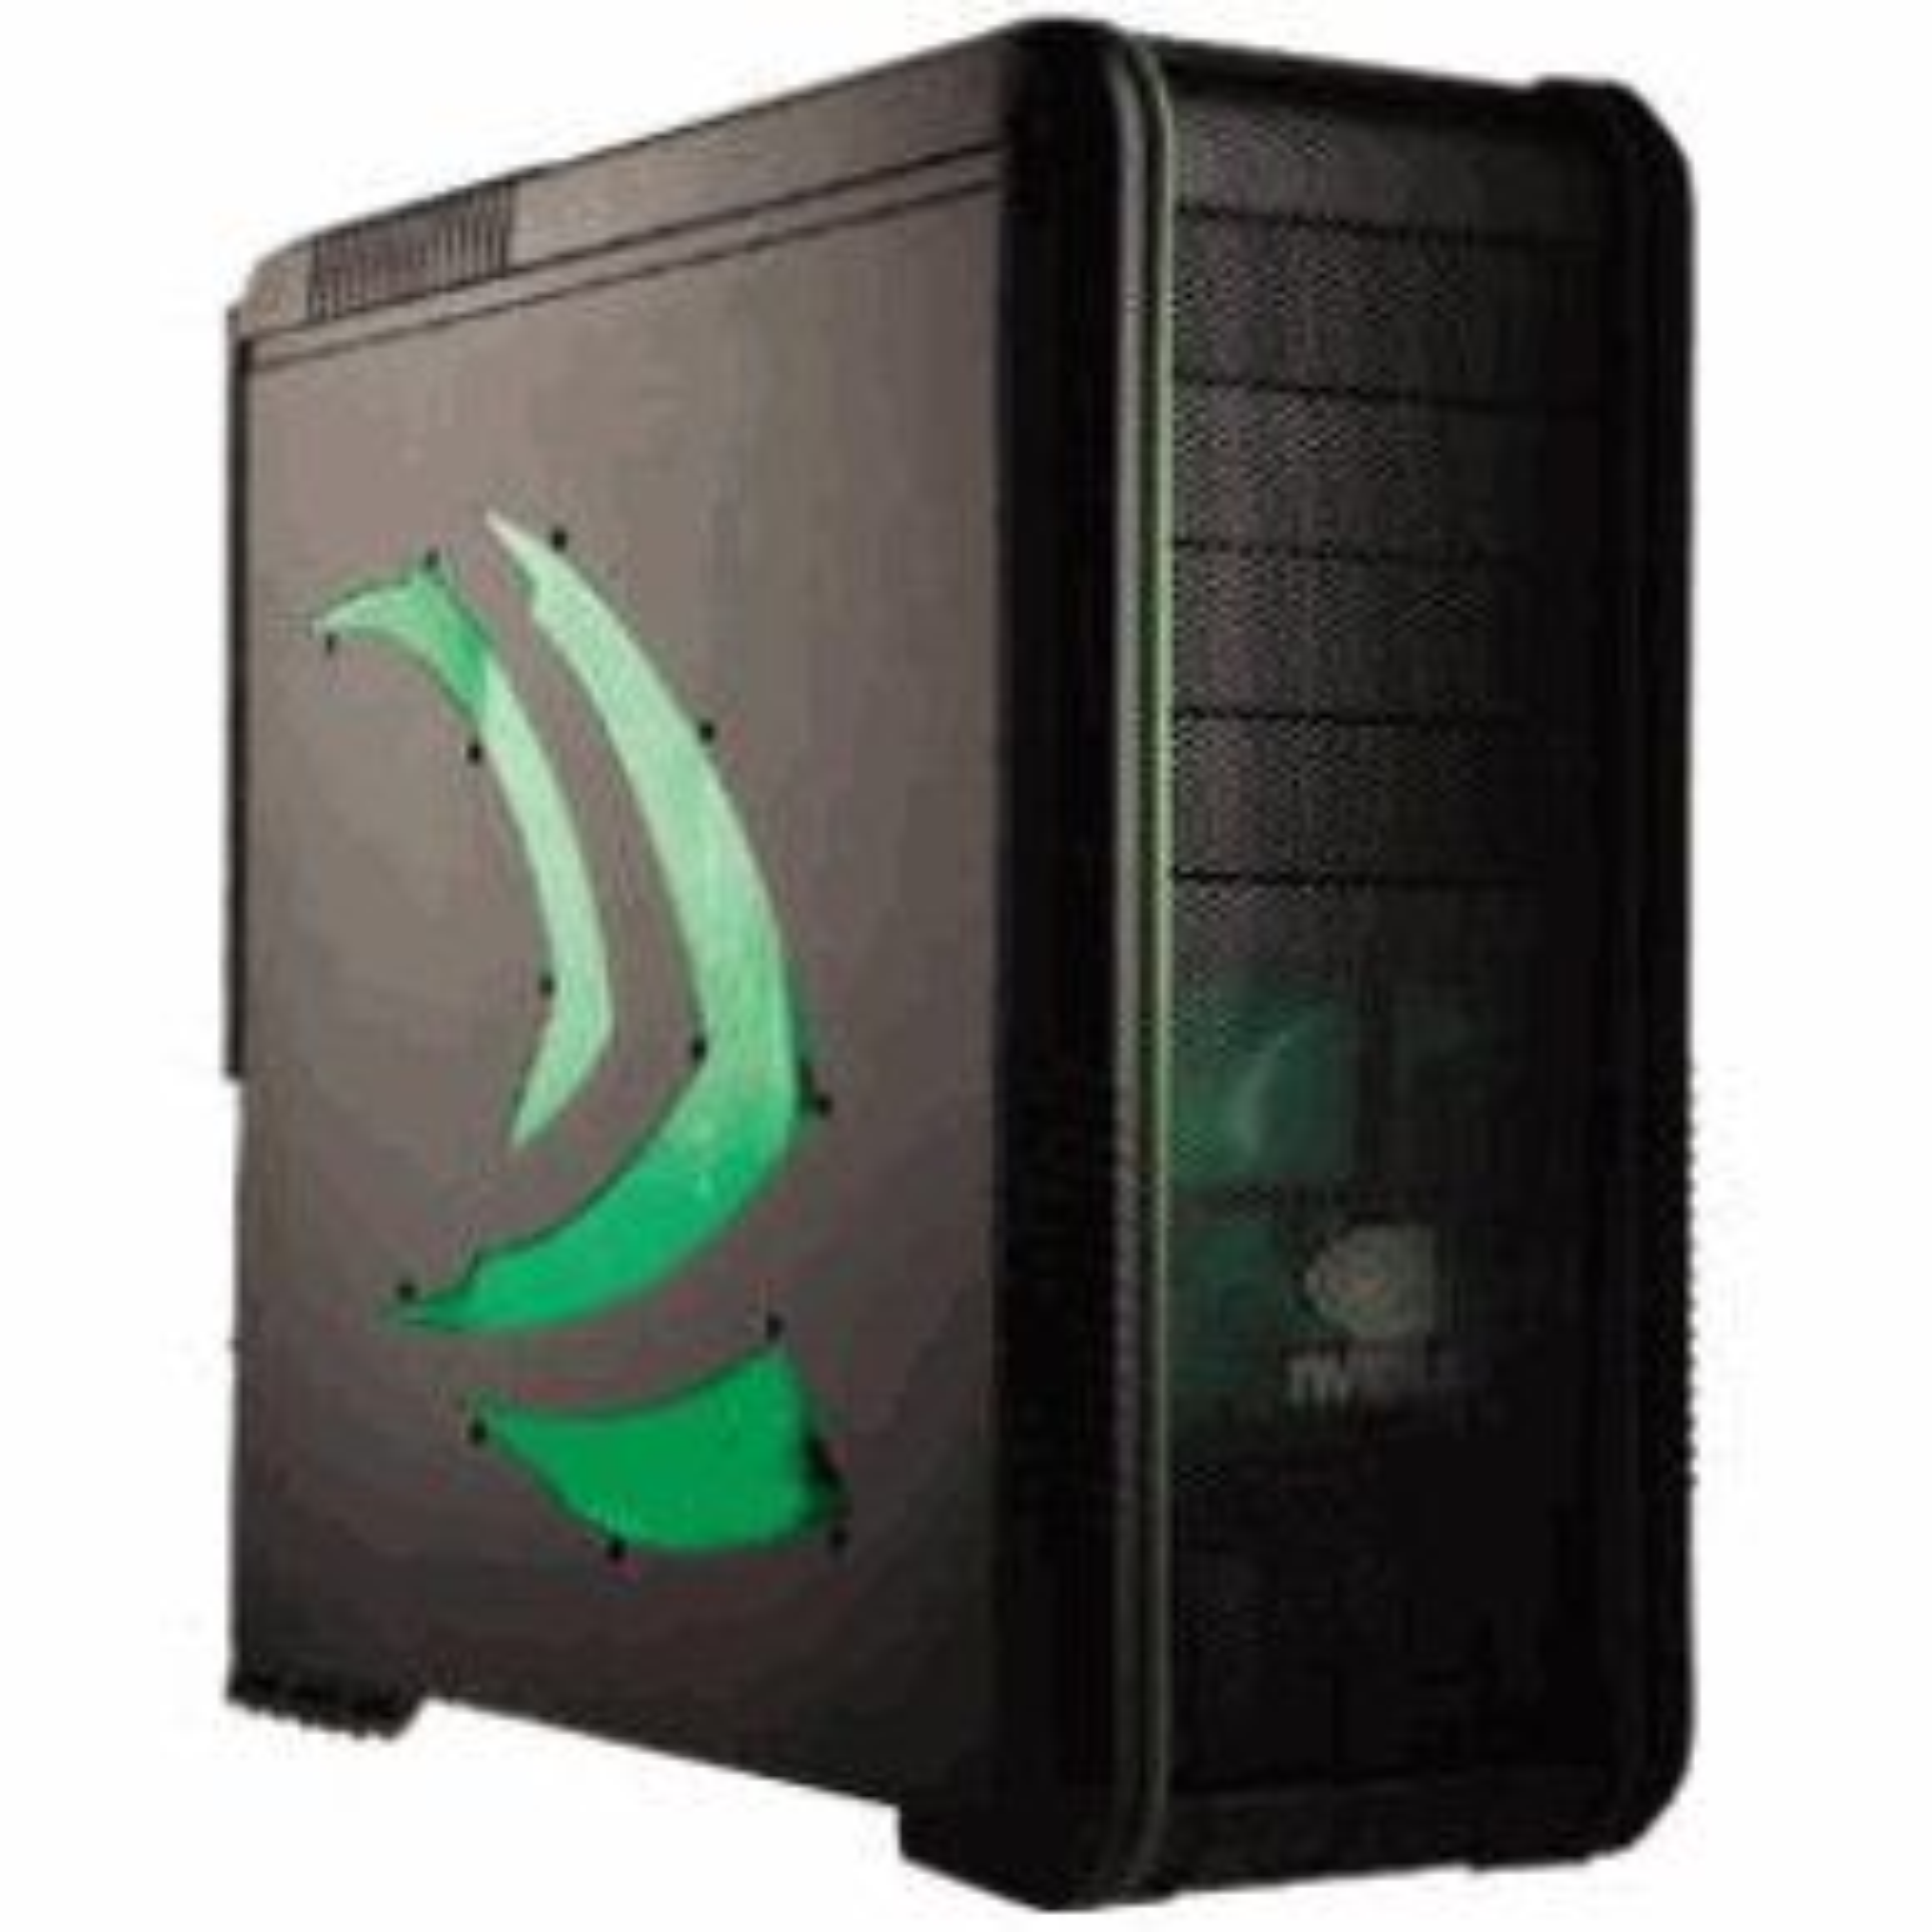 Cooler Master CM 690 II Nvidia Edition